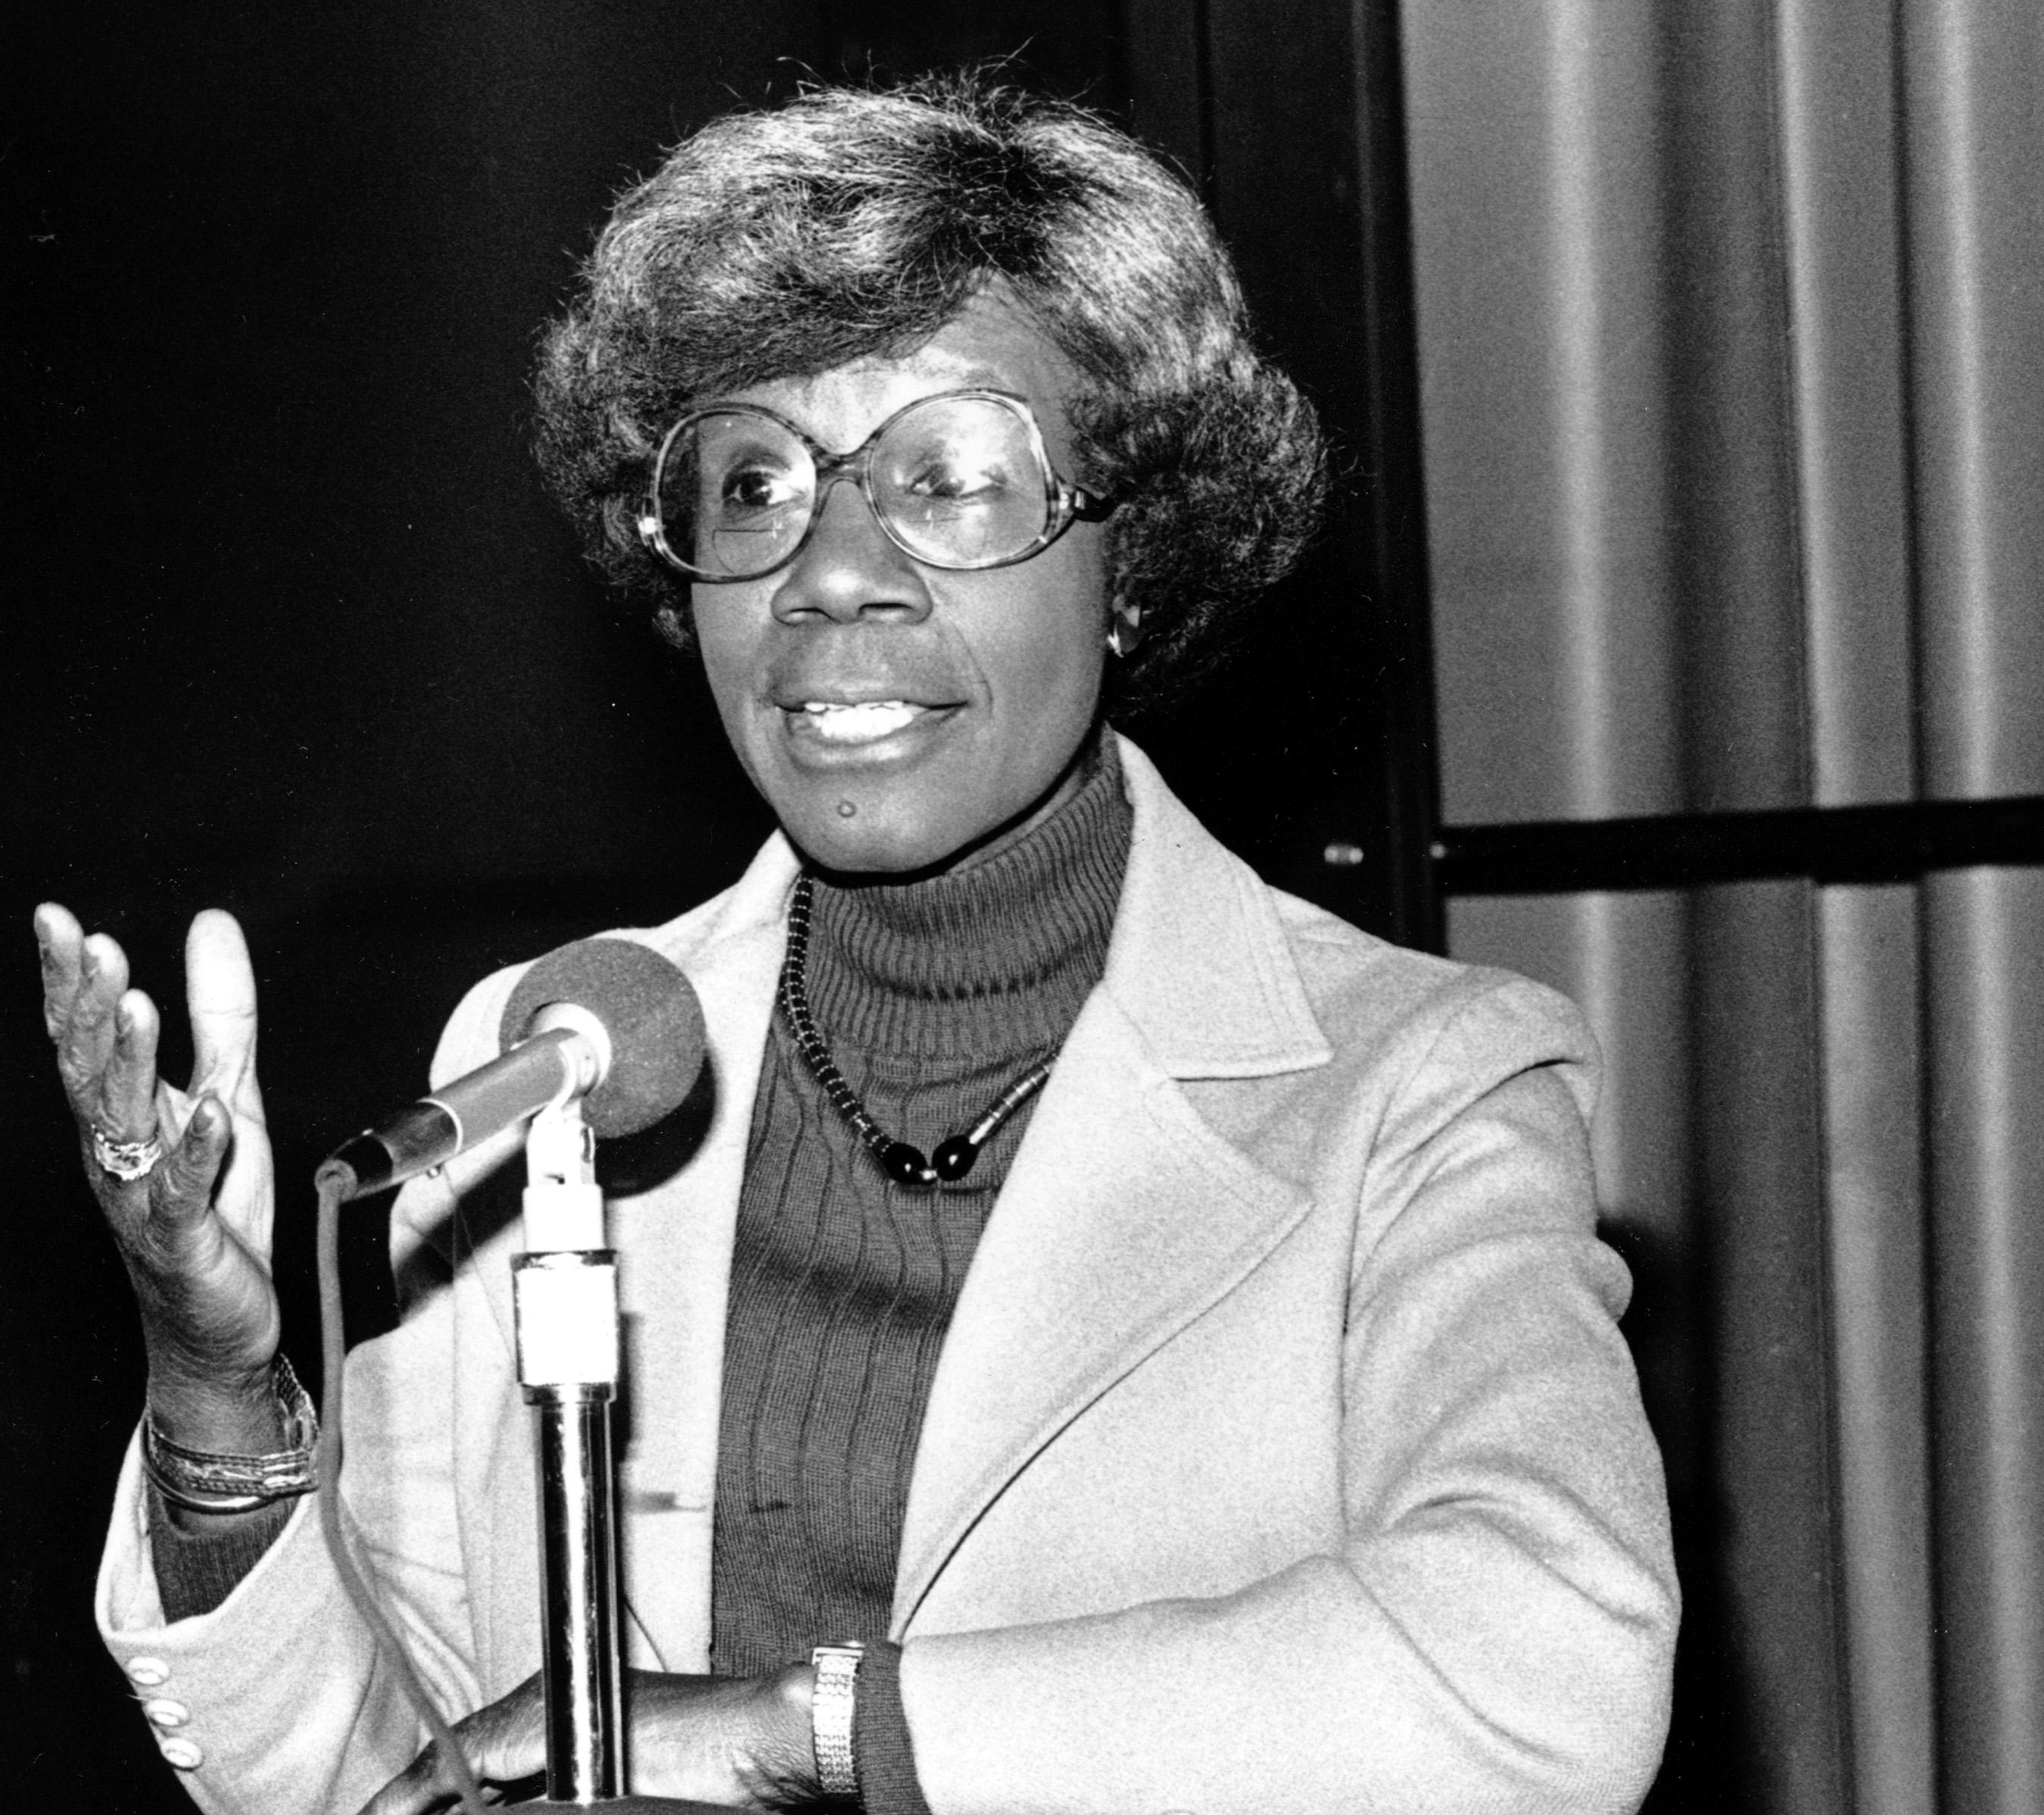 Congresswoman Shirley Chisholm in 1982.